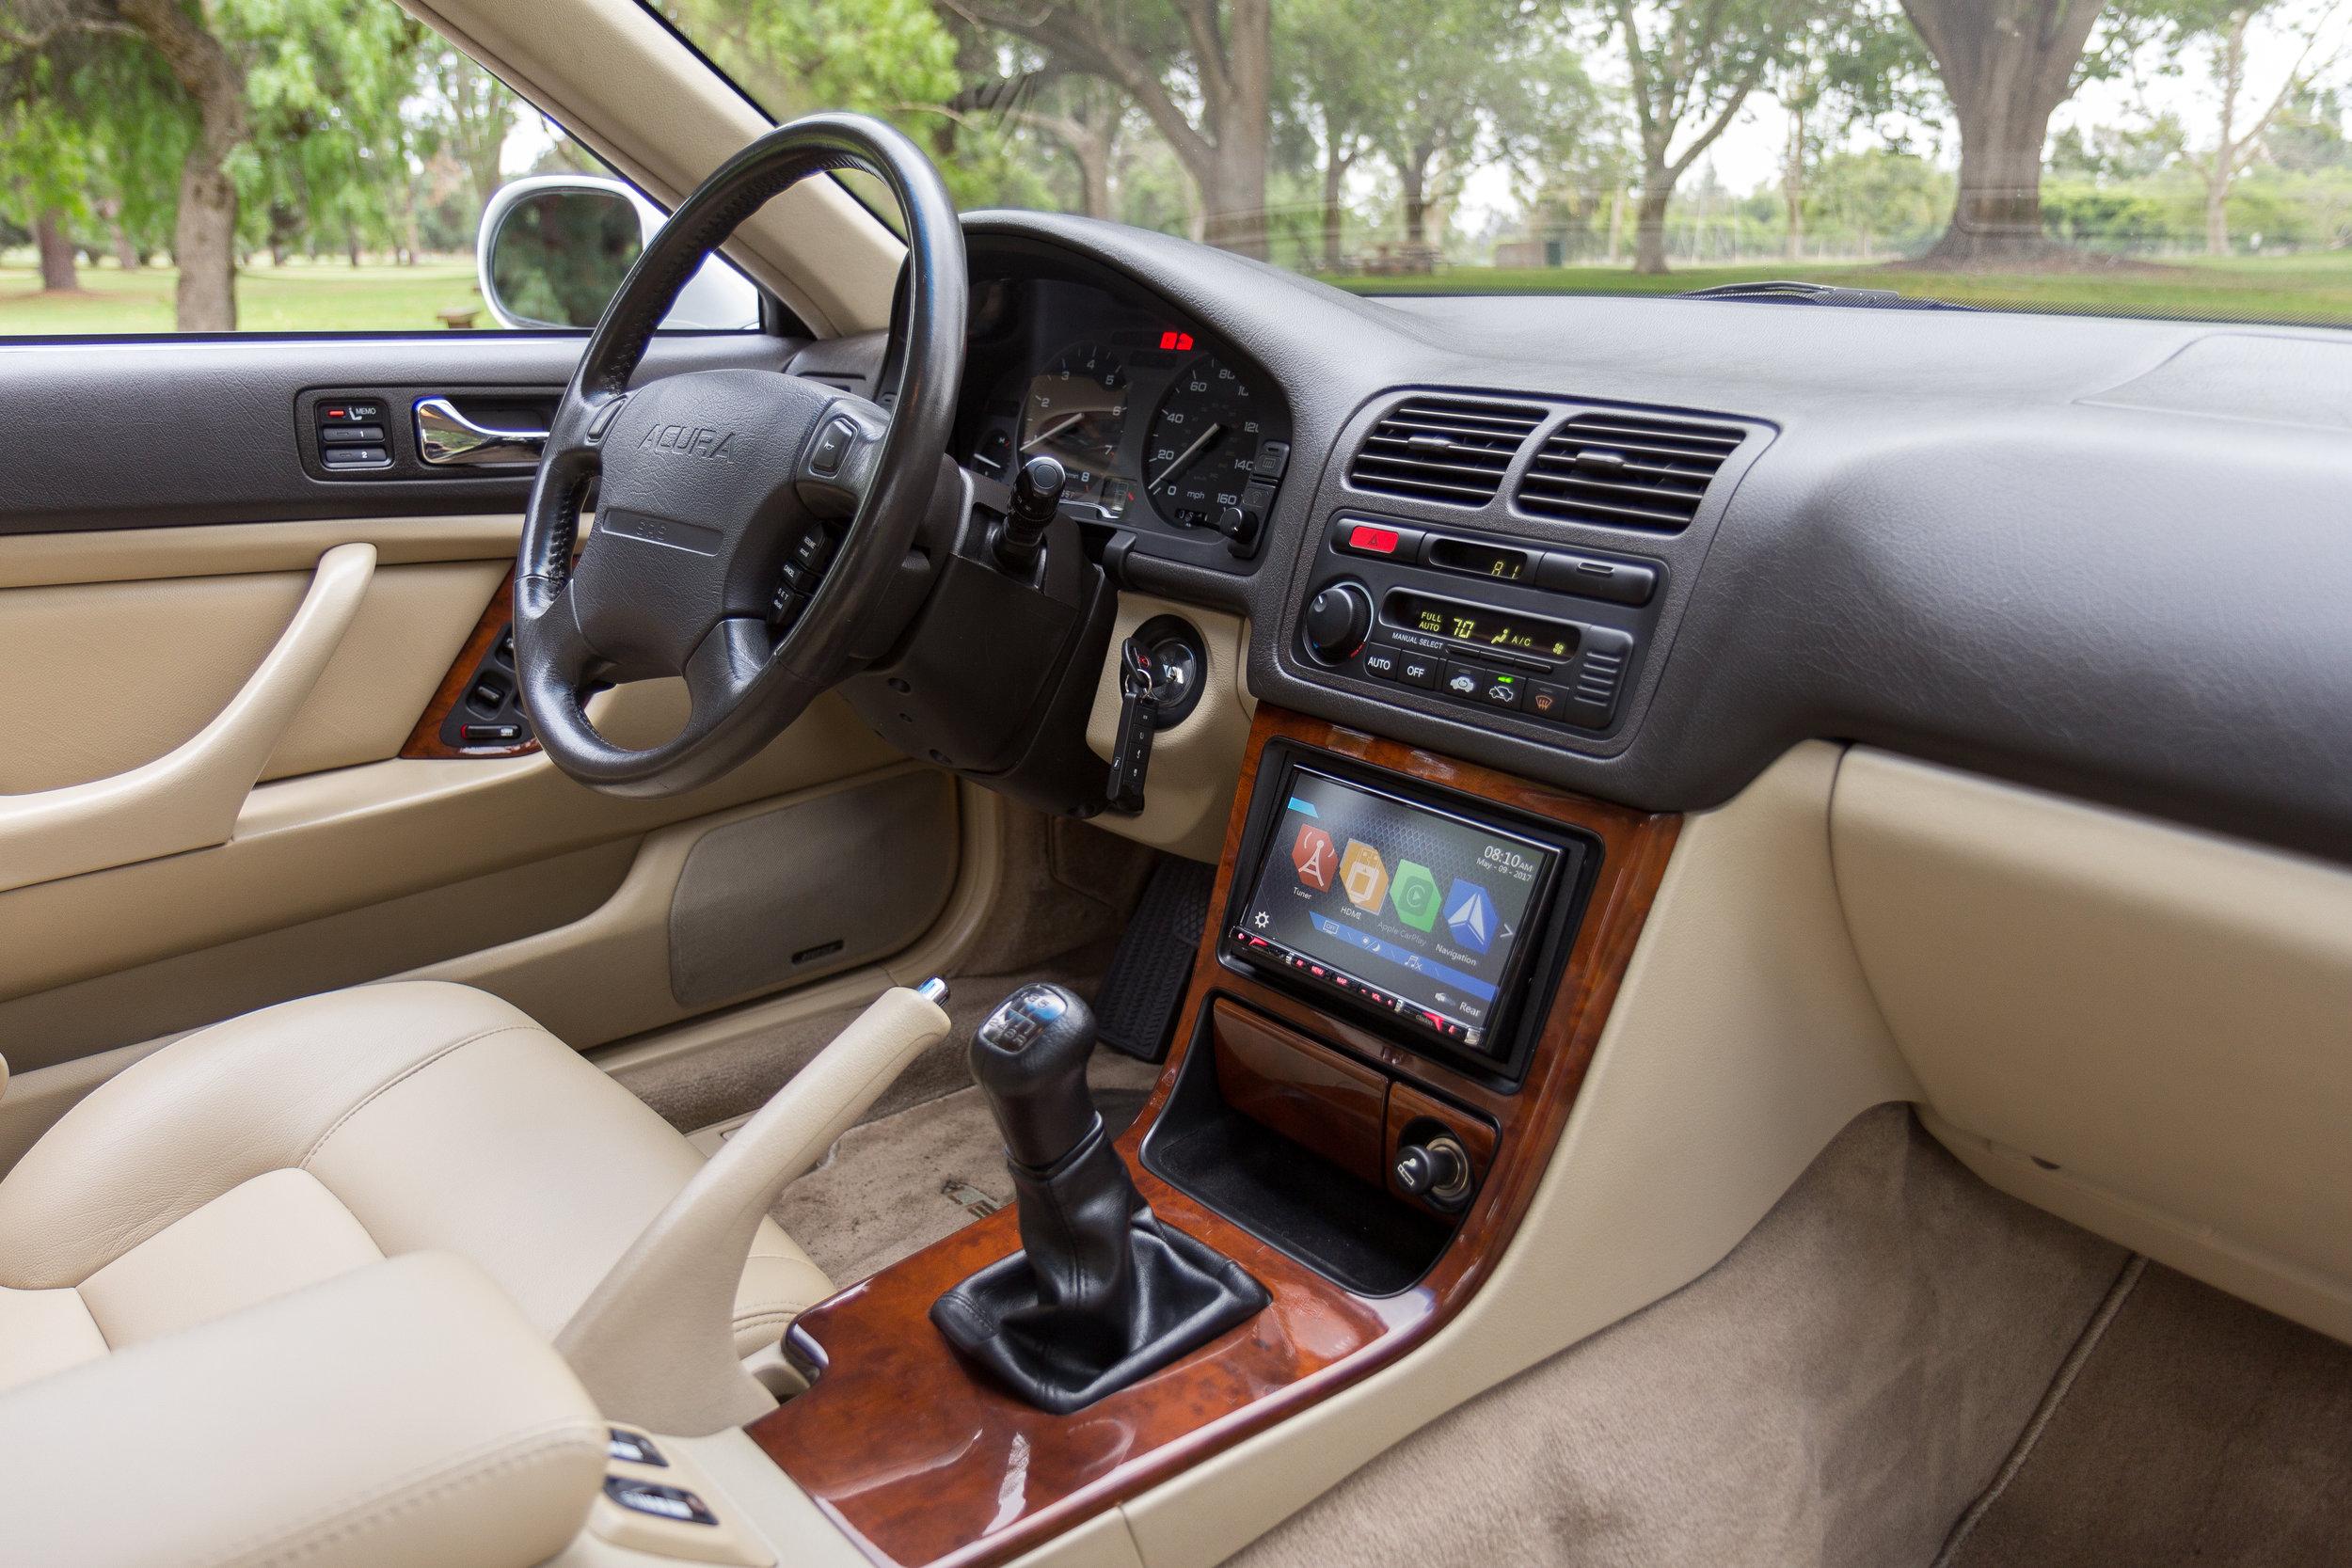 1994 Acura Legend Coupe-73.JPG